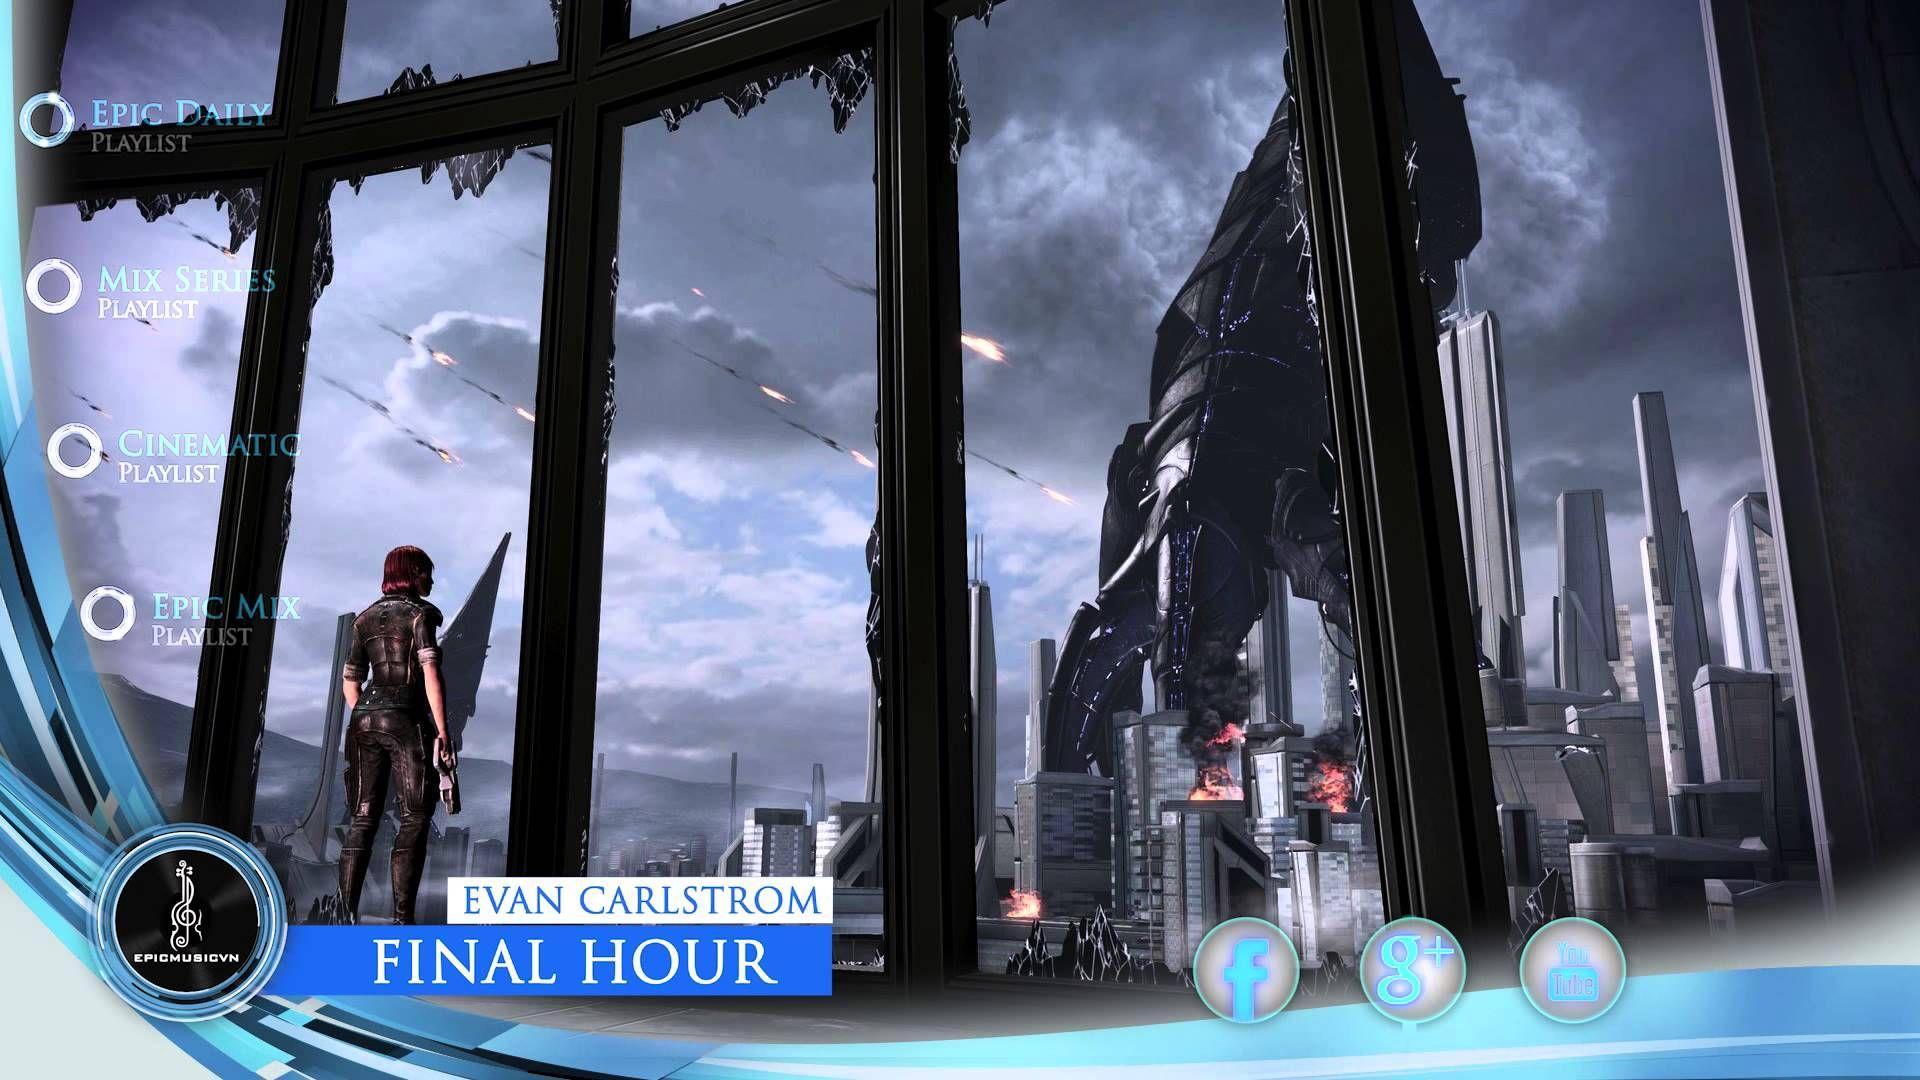 Evan Carlstrom - Final Hour | Epic Music 2 0 | Mass effect